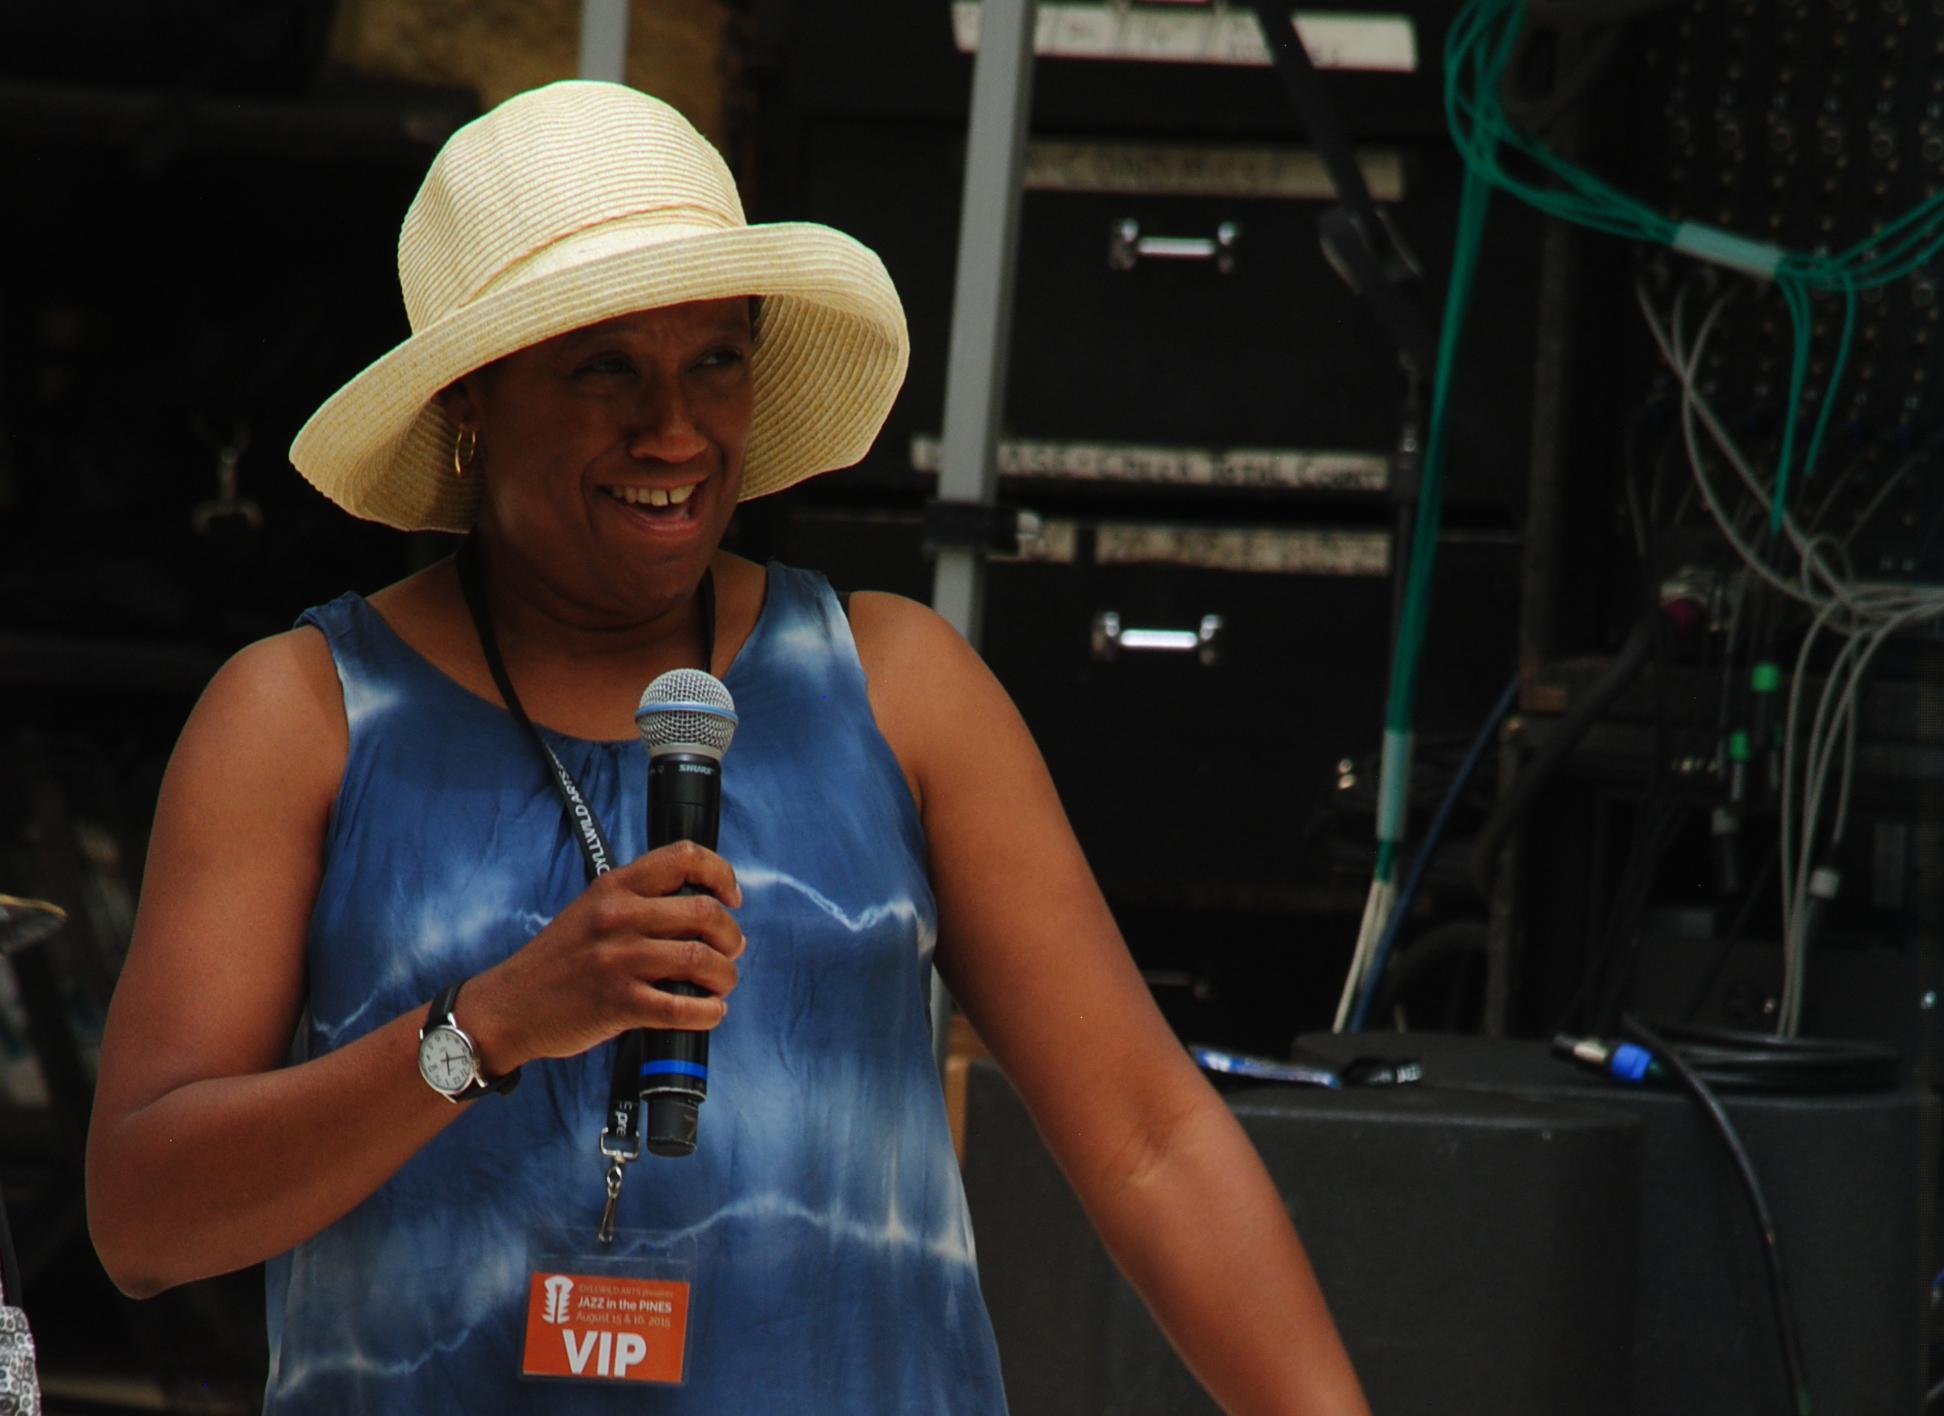 Below, Idyllwild Arts President Pamela Jordan talks to the crowd at the Main Stage. Photo by JP Crumrine